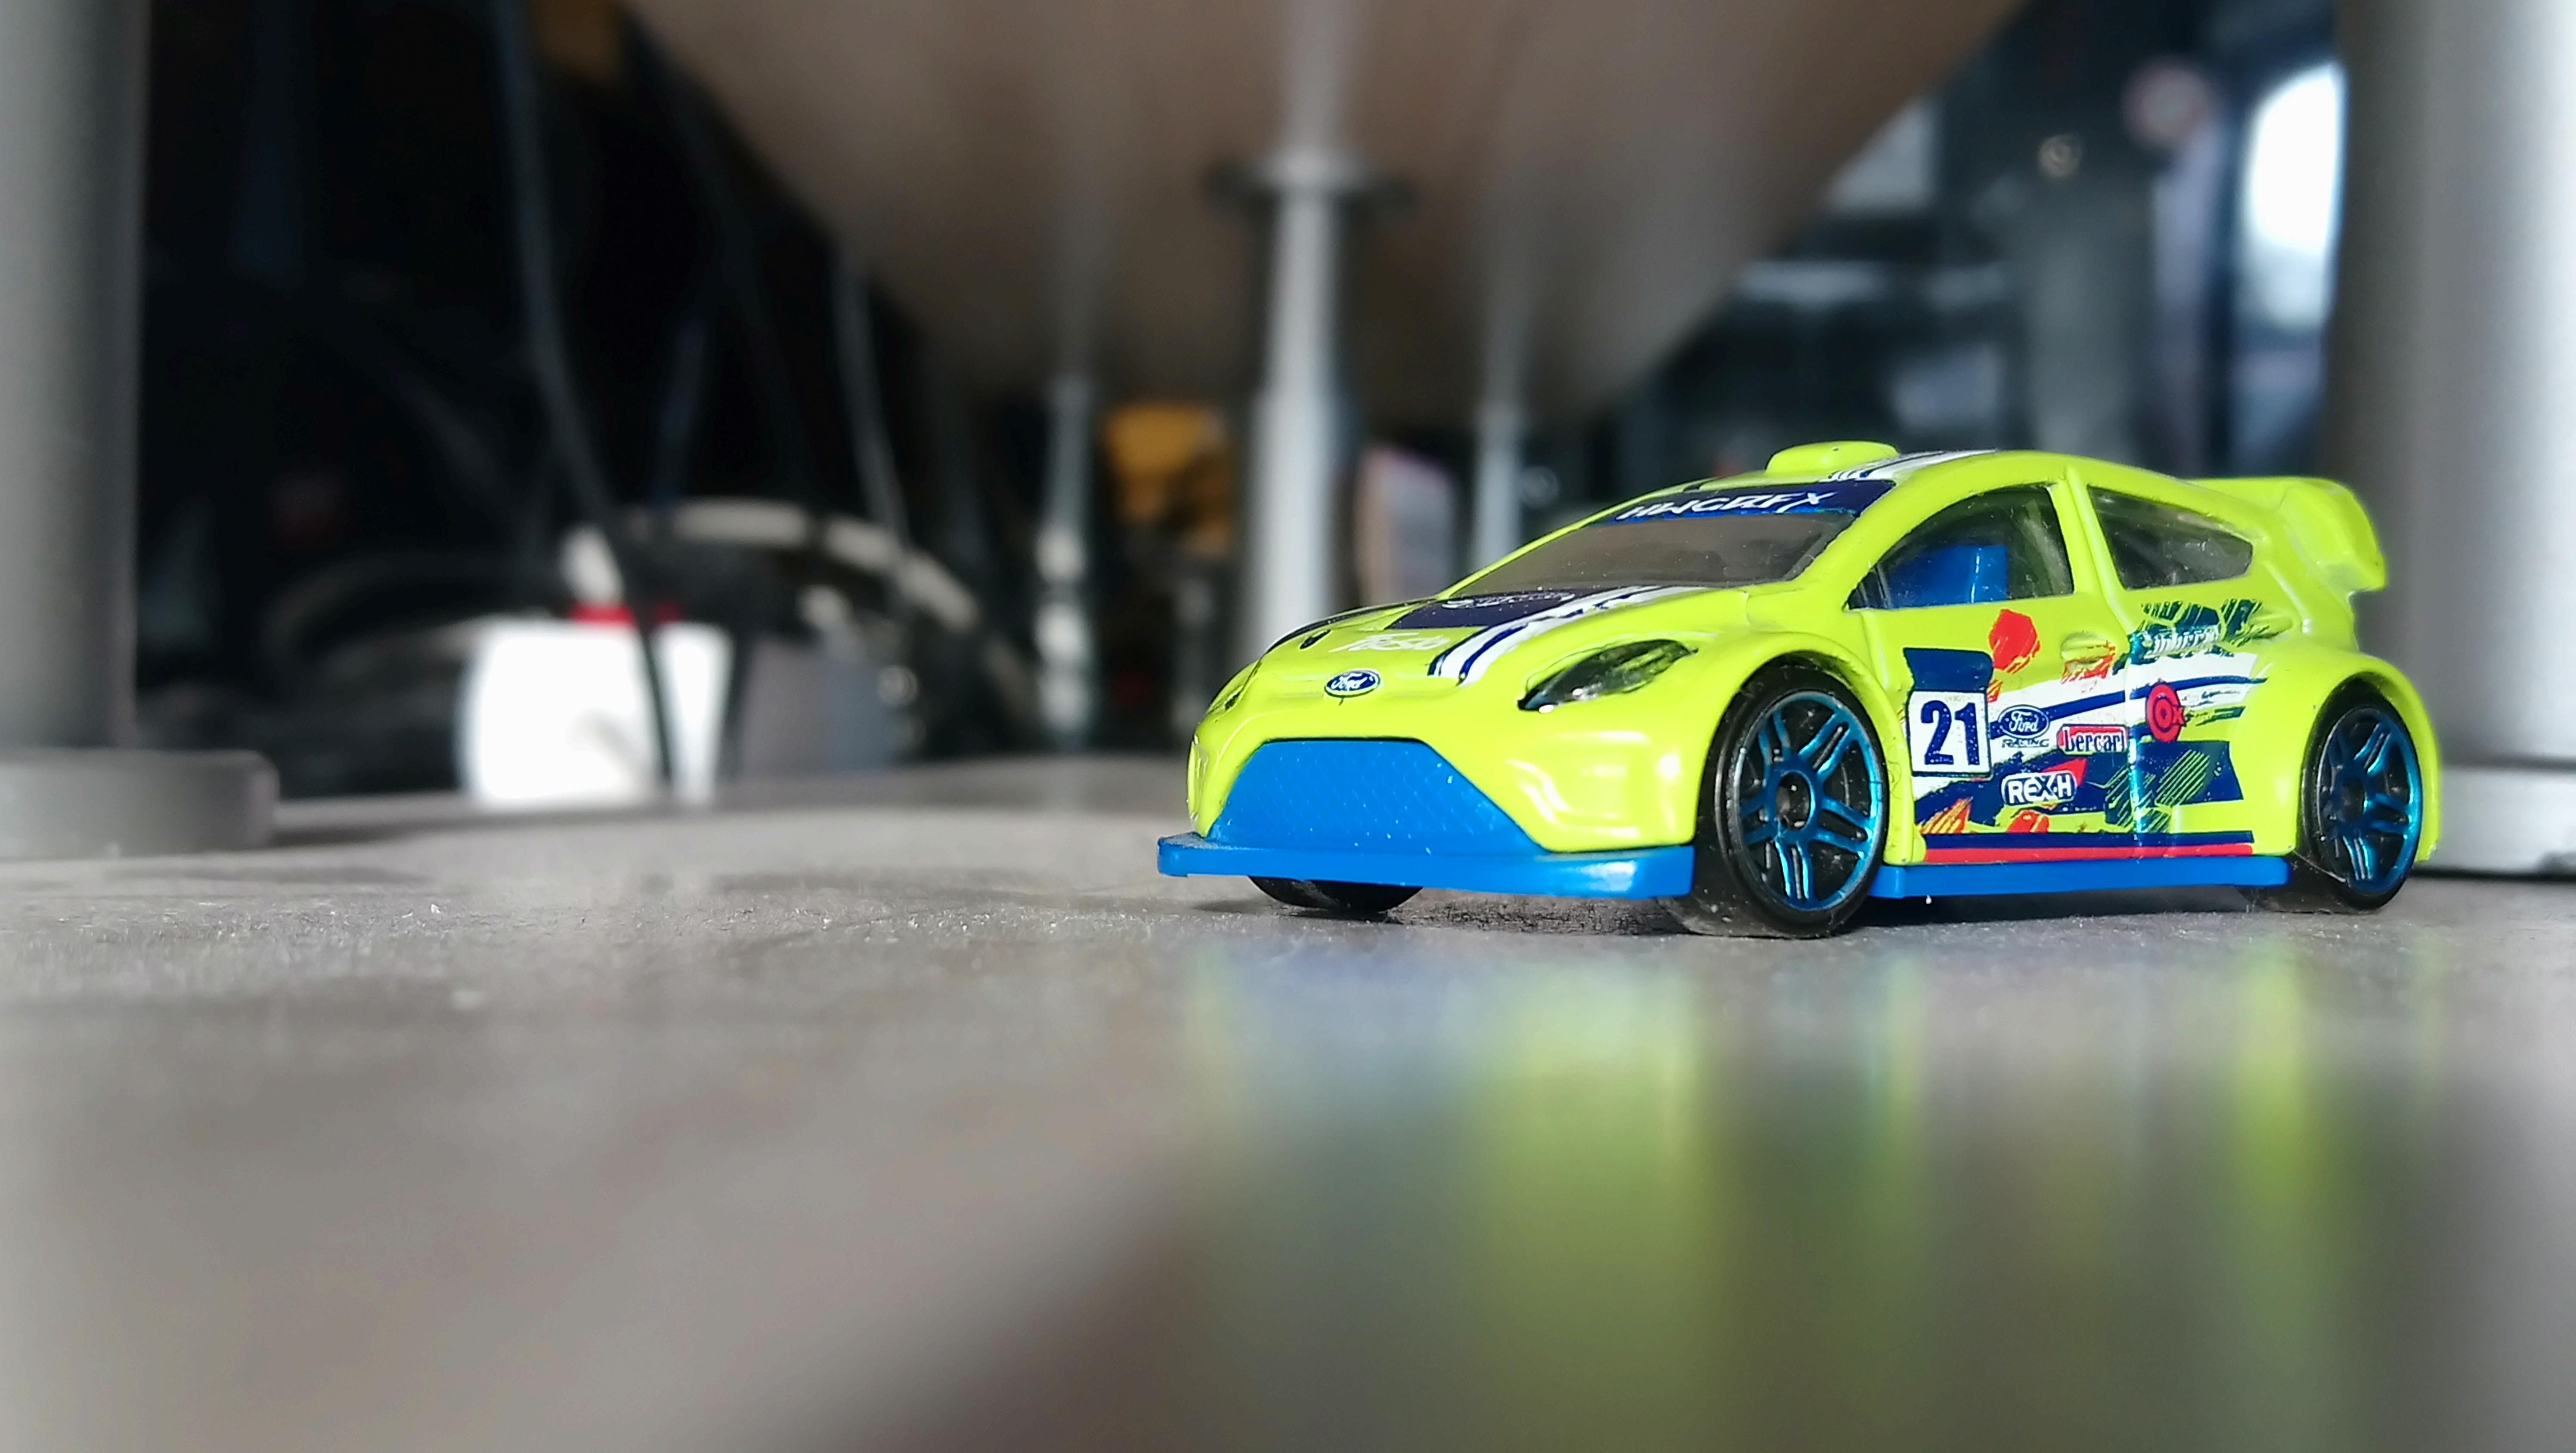 Wallpaper Car Race Cars Toys Dust Reflection Hot Wheels